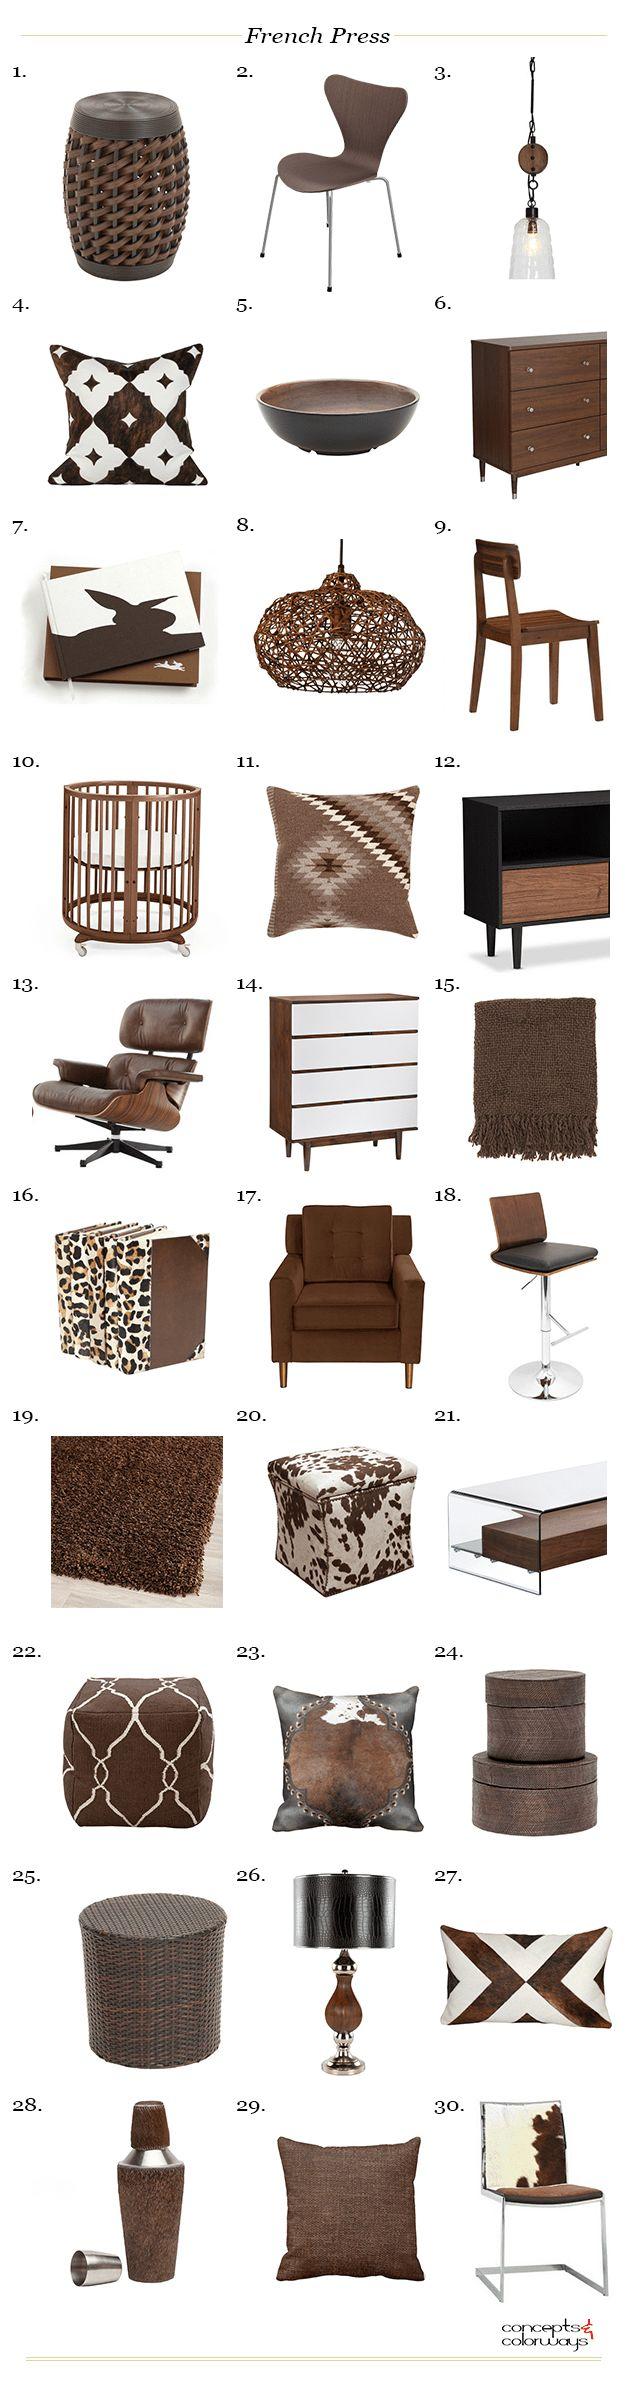 Paredes con color y accesorios neutrales - Benjamin Moore French Press Chocolate Brown Product Roundup Interior Styling Ideas Interior Design